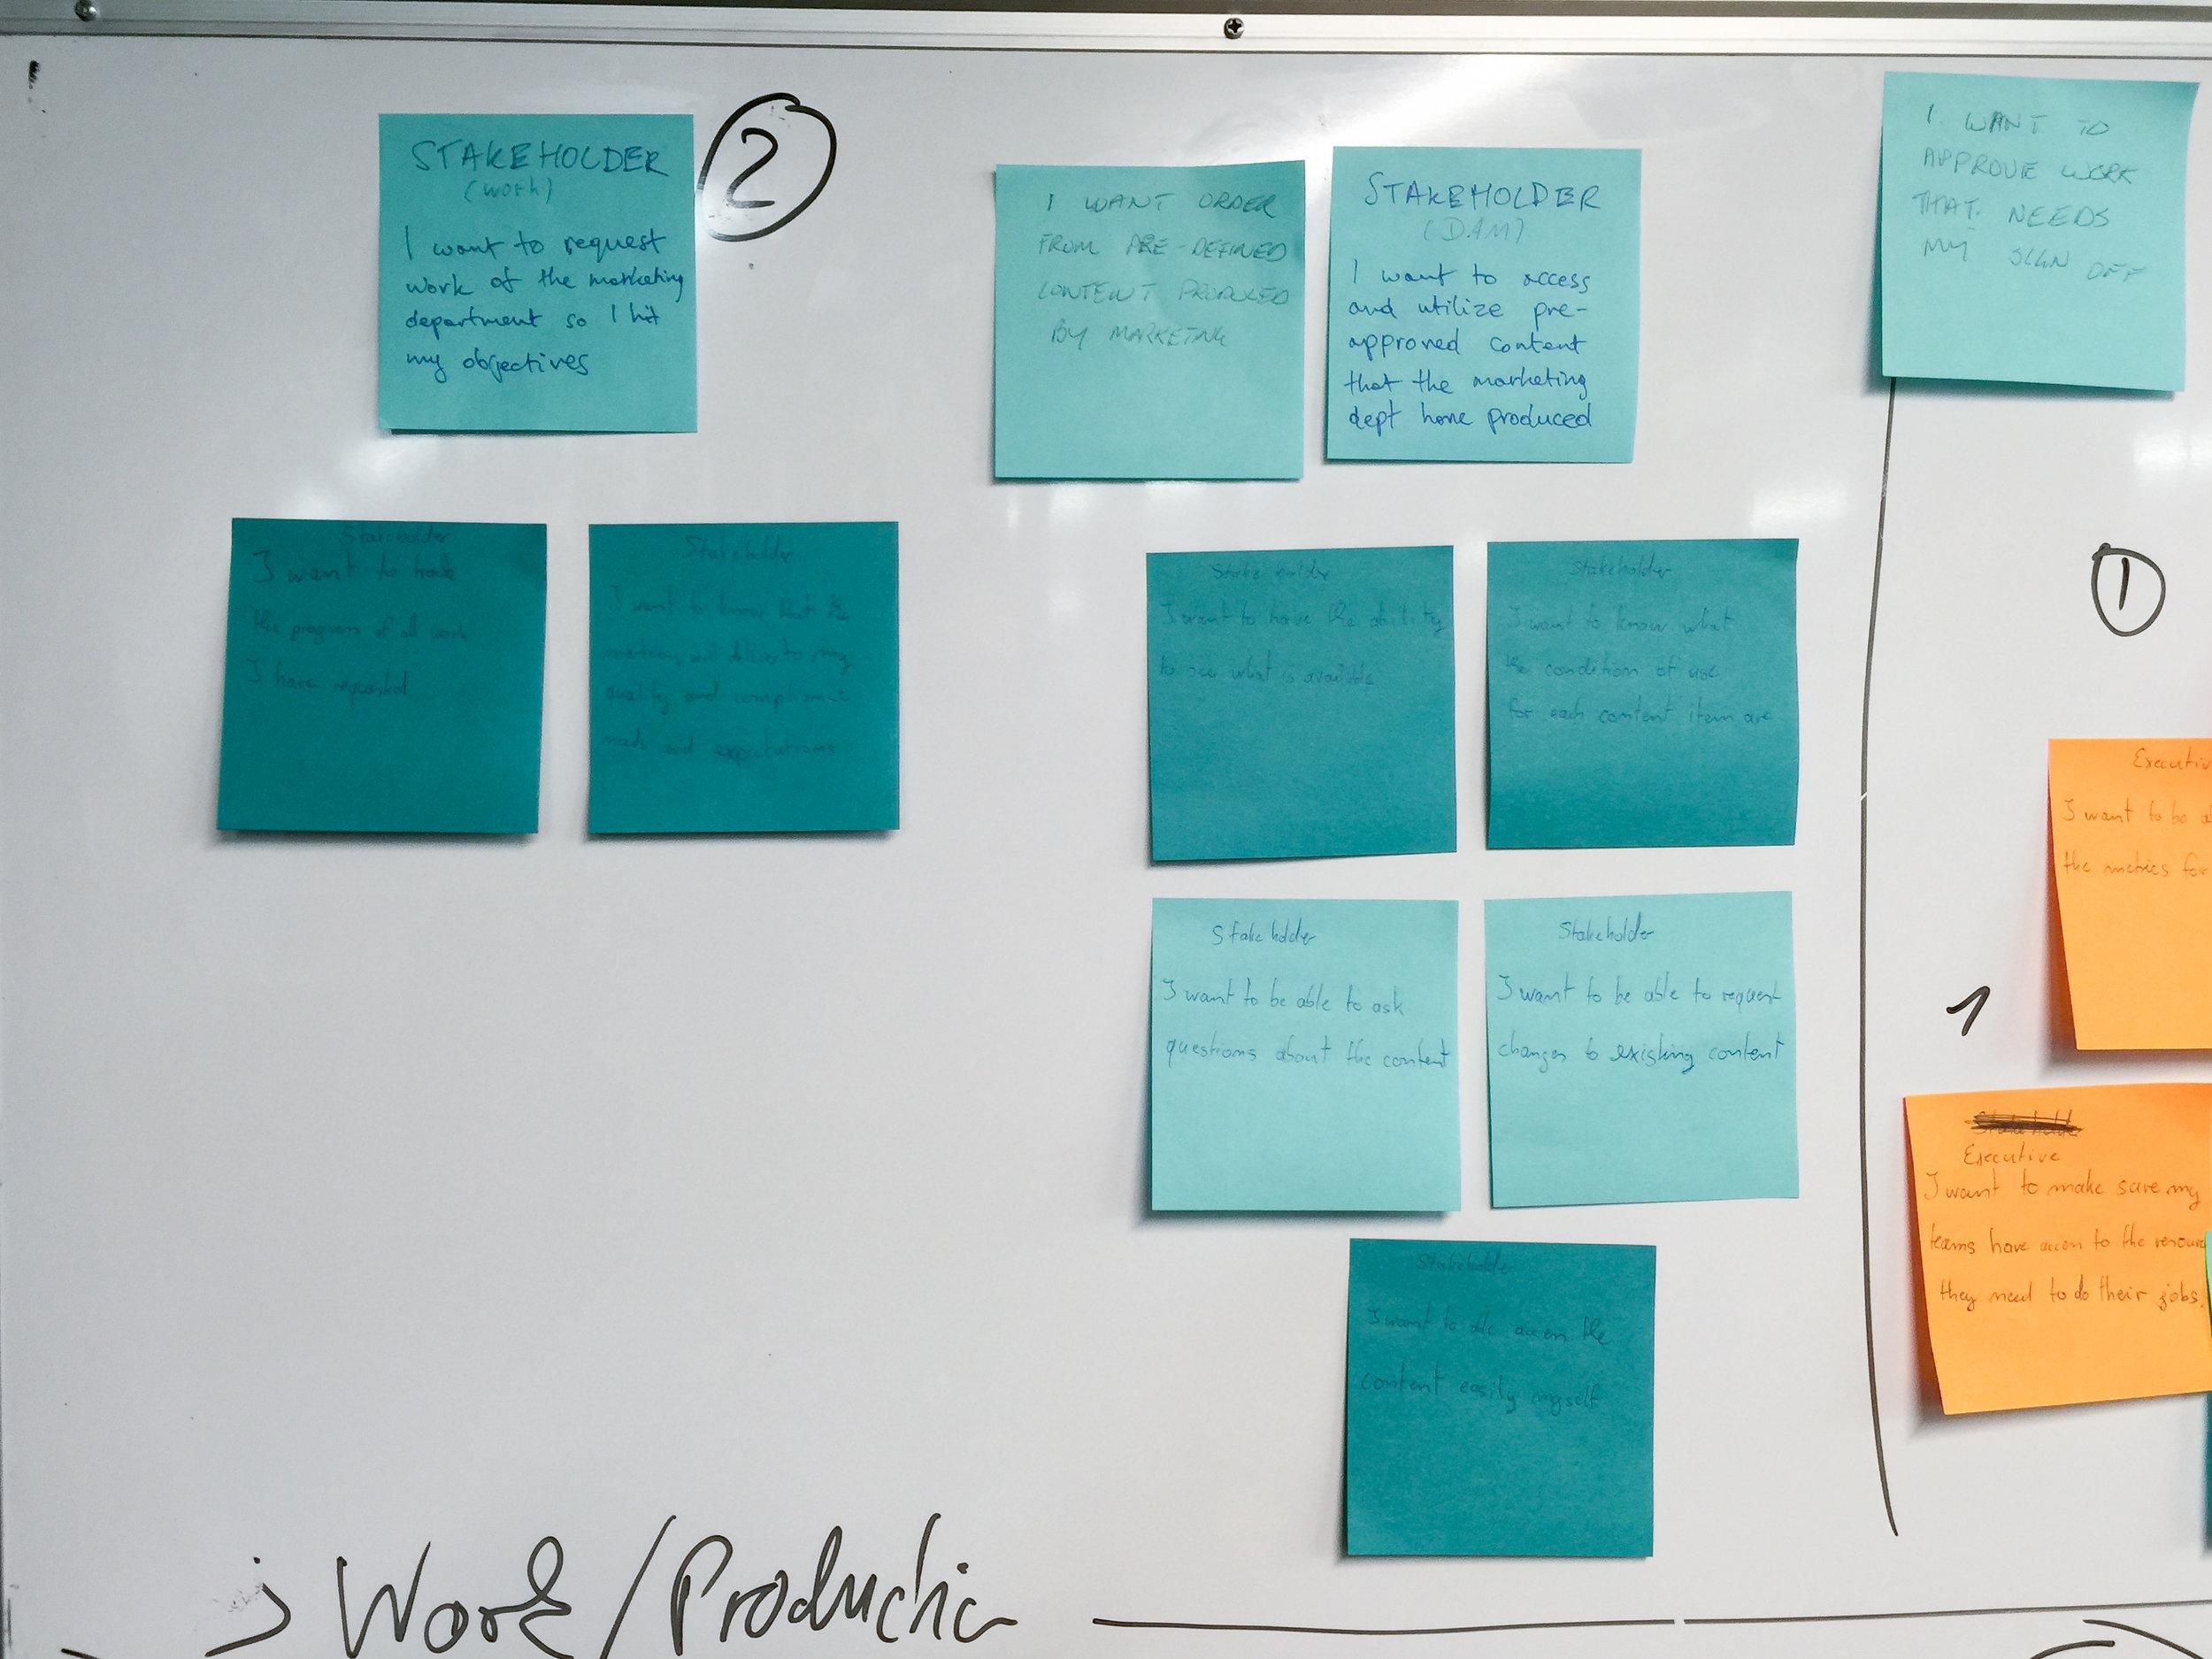 160613-0406a-wprasek- Simple work sticky notes.jpg